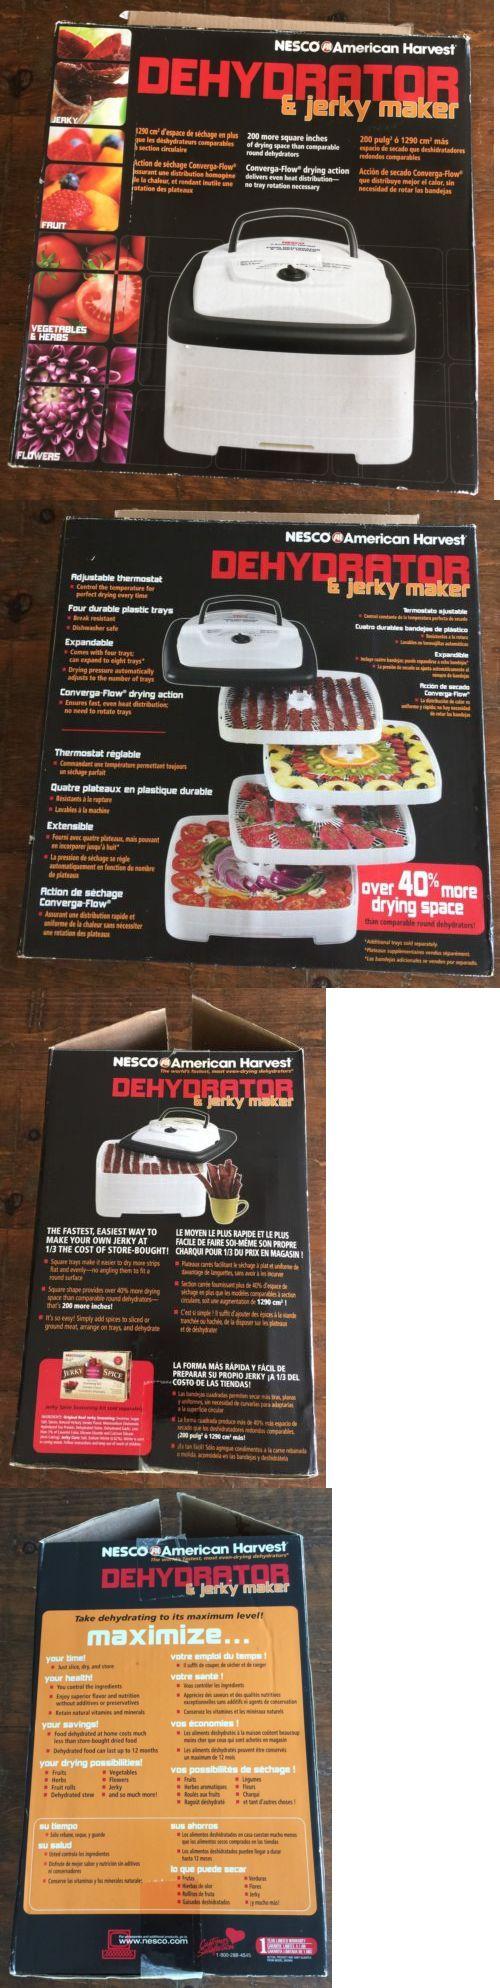 Food Dehydrators 32883: Nesco American Harvest Dehydrator And Jerky Maker -> BUY IT NOW ONLY: $39.99 on eBay!